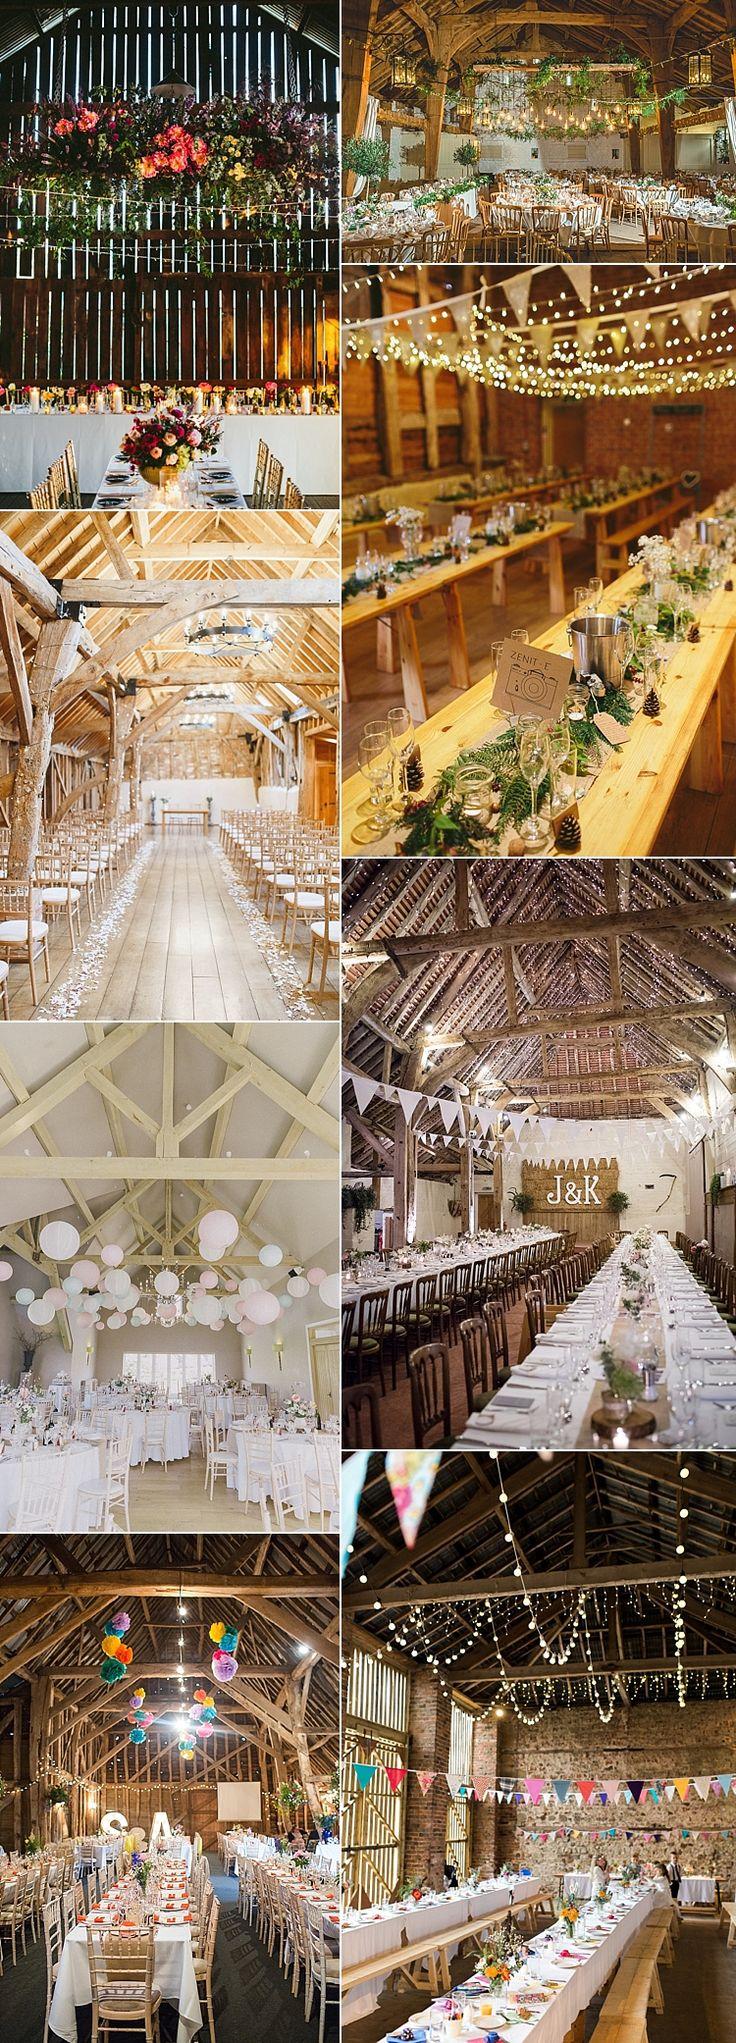 Barn Weddings Ideas u0026 Inspiration 203 best